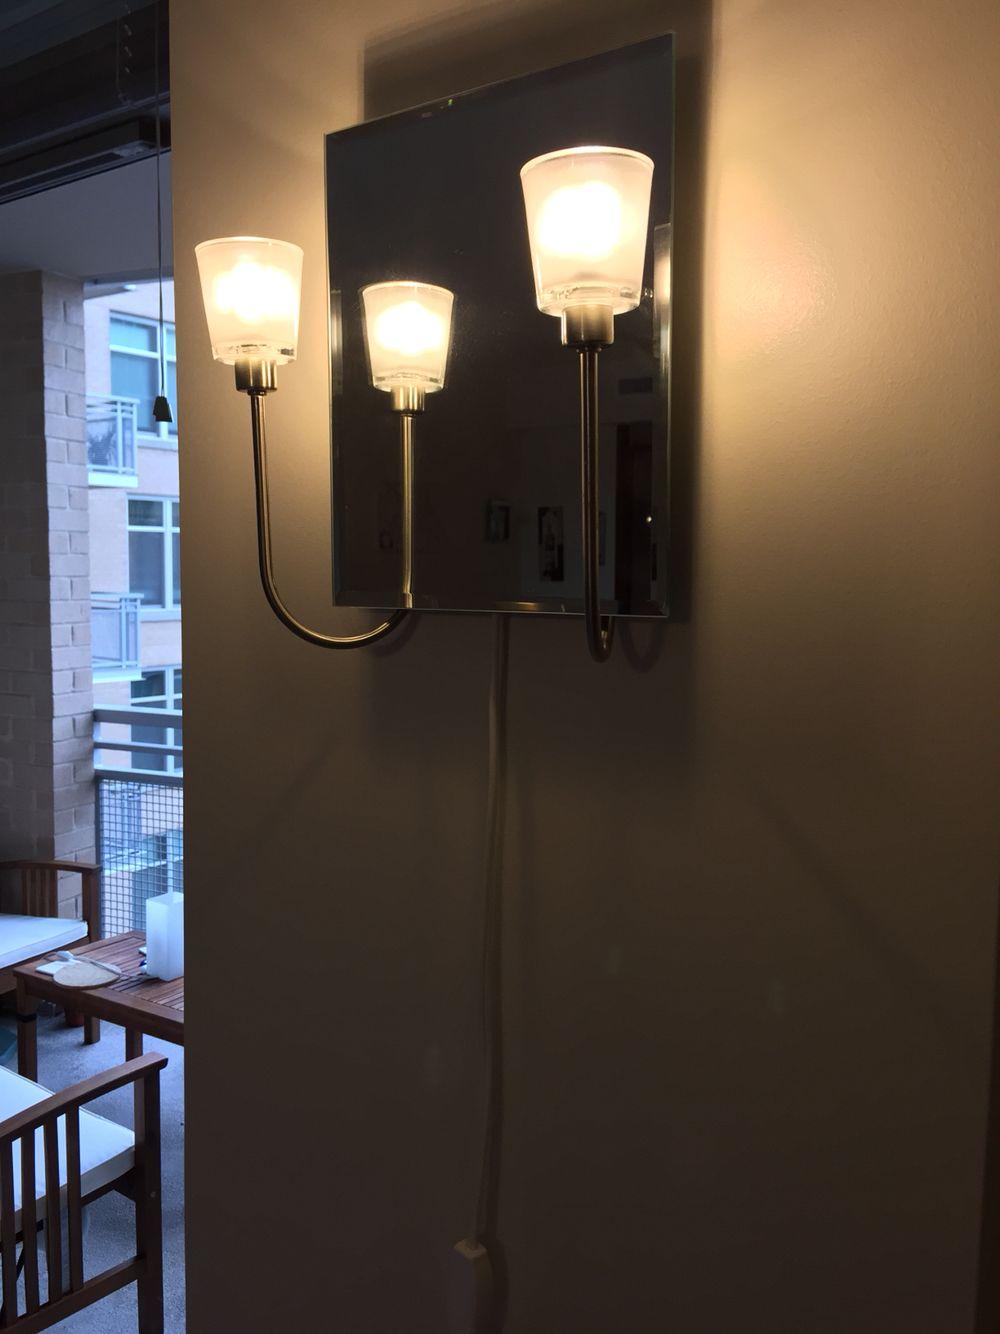 IKEA kryssbo wall sconce with mirror